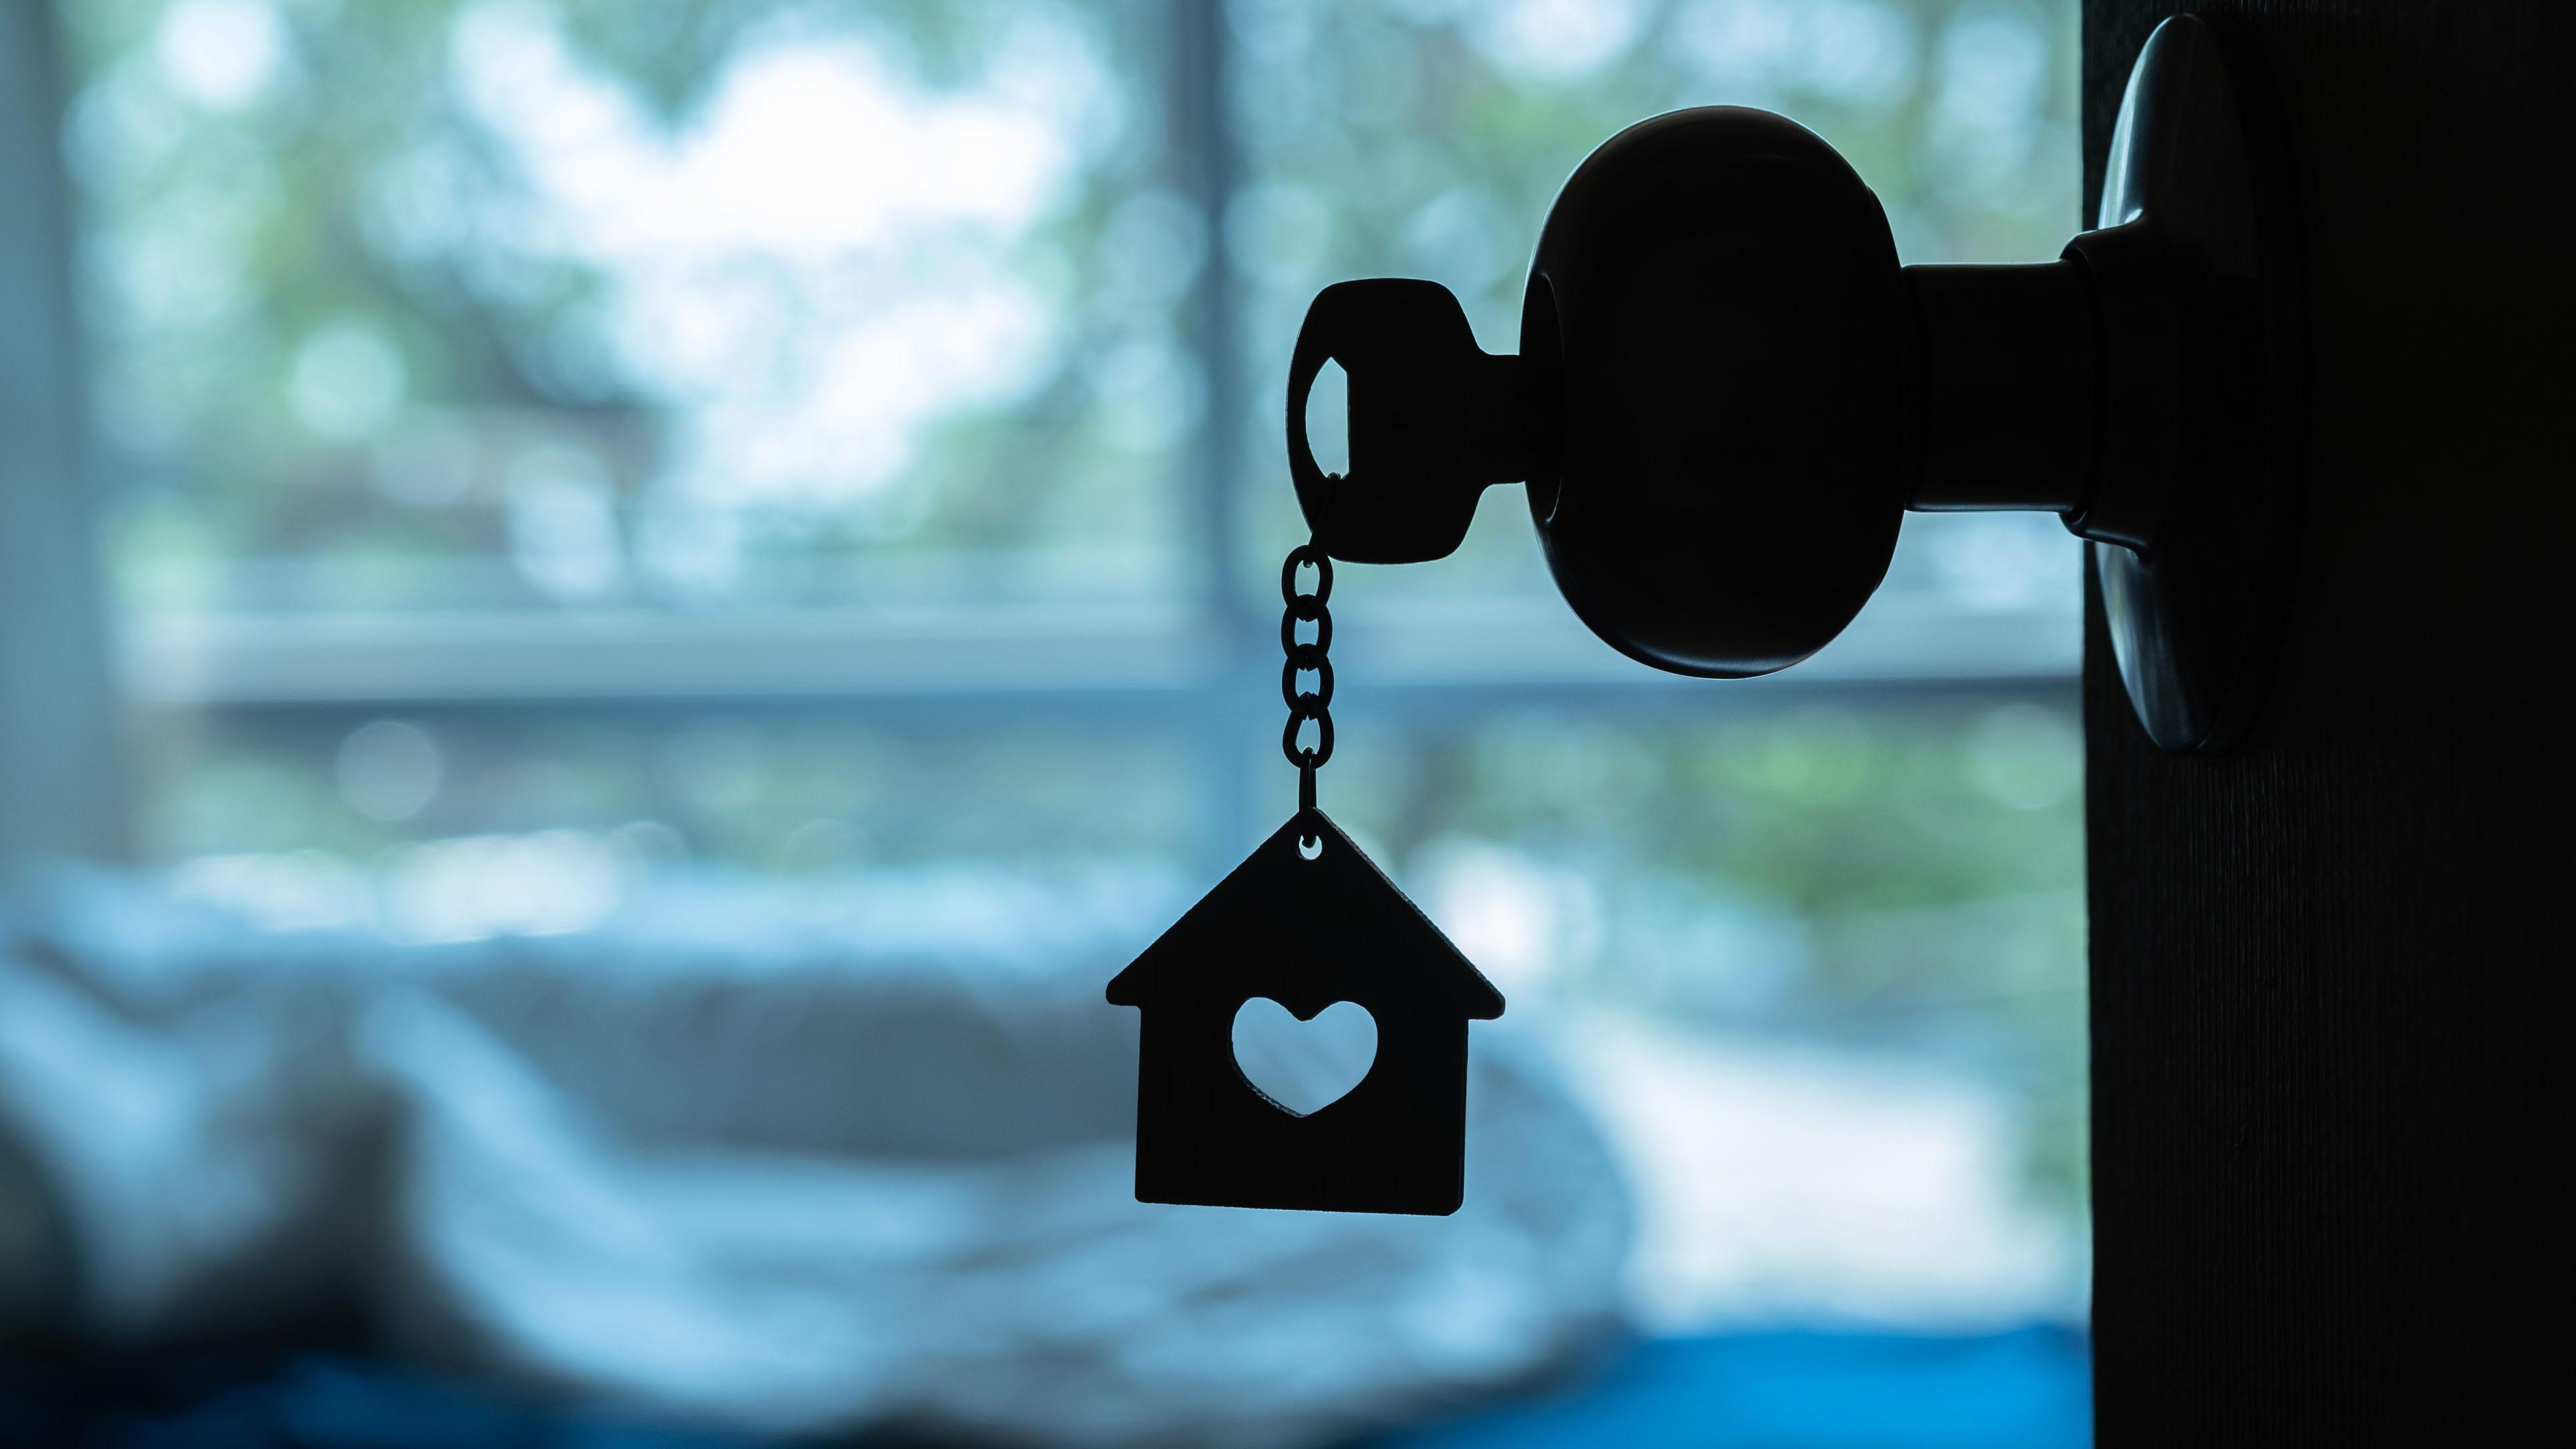 Immobilien-Makler-Schalter virtuellen offenen Häuser inmitten der Corona-Virus-Ausbruch